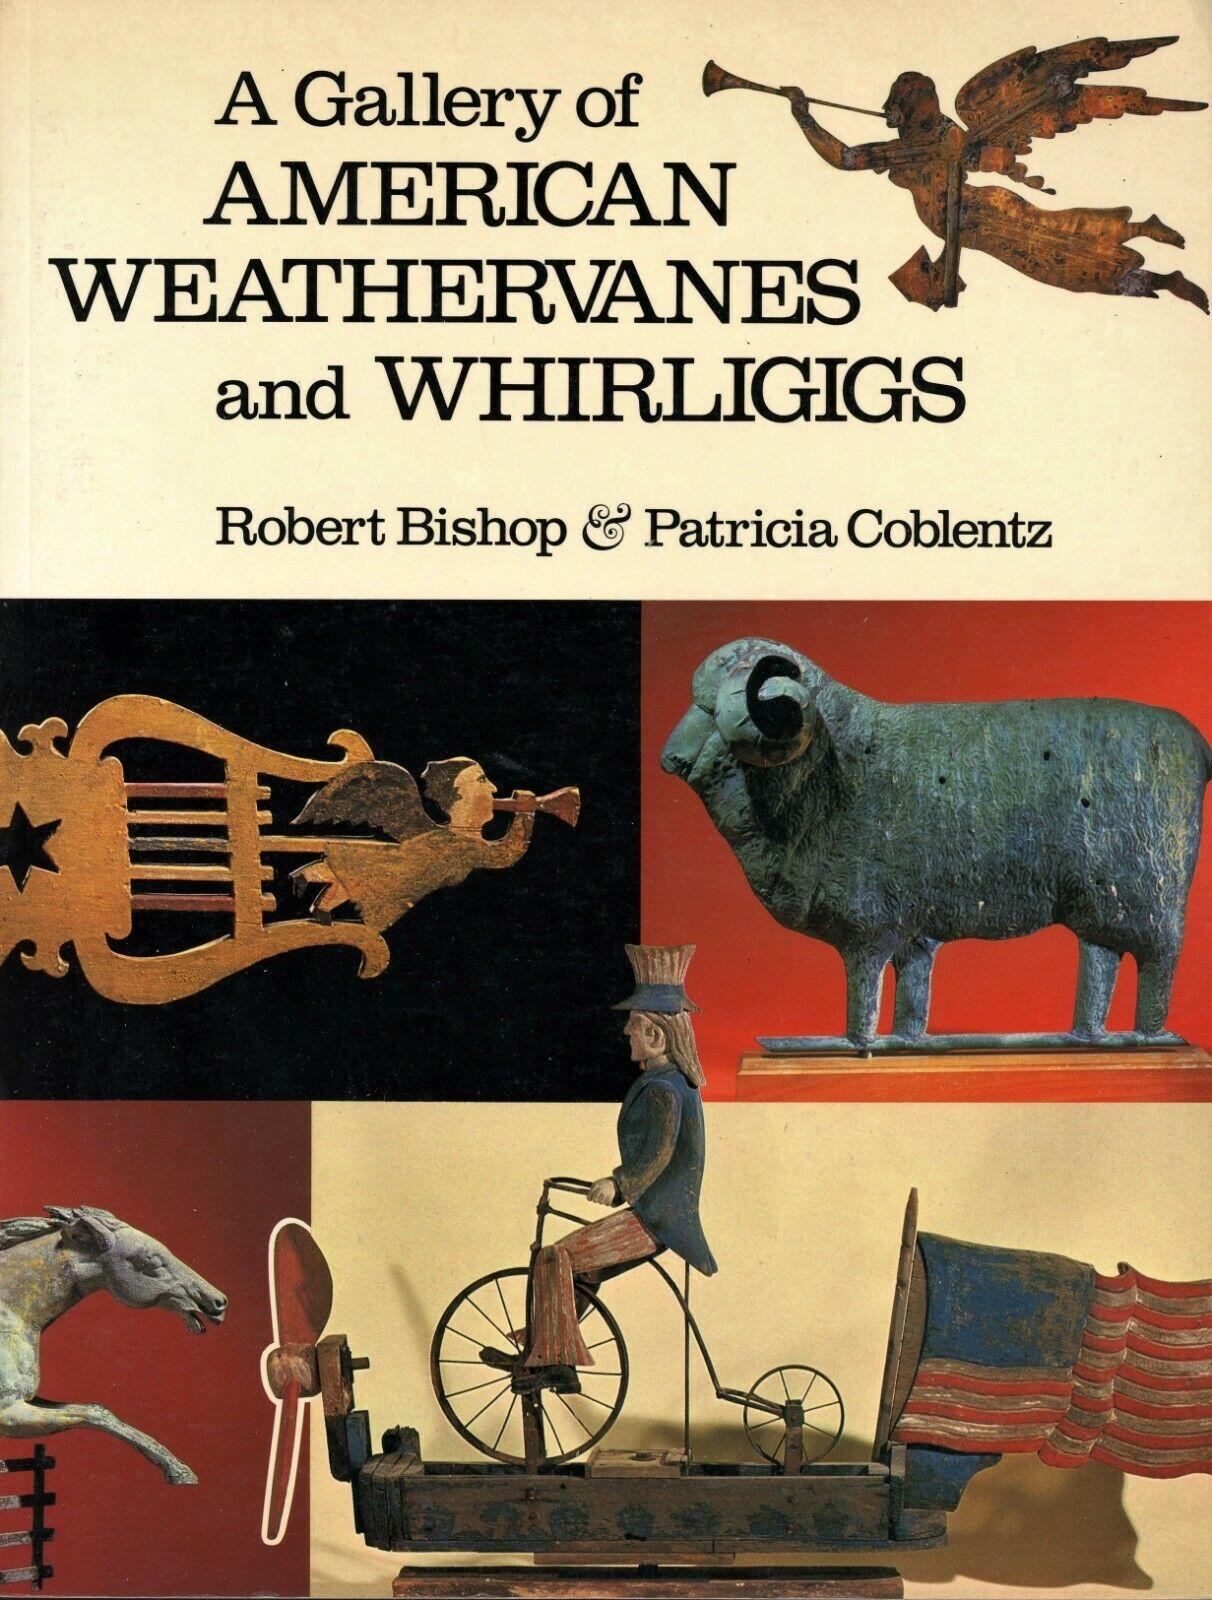 Antique Folk Art Weathervanes Weather Vanes Whirligigs - Types Dates Etc. / Book